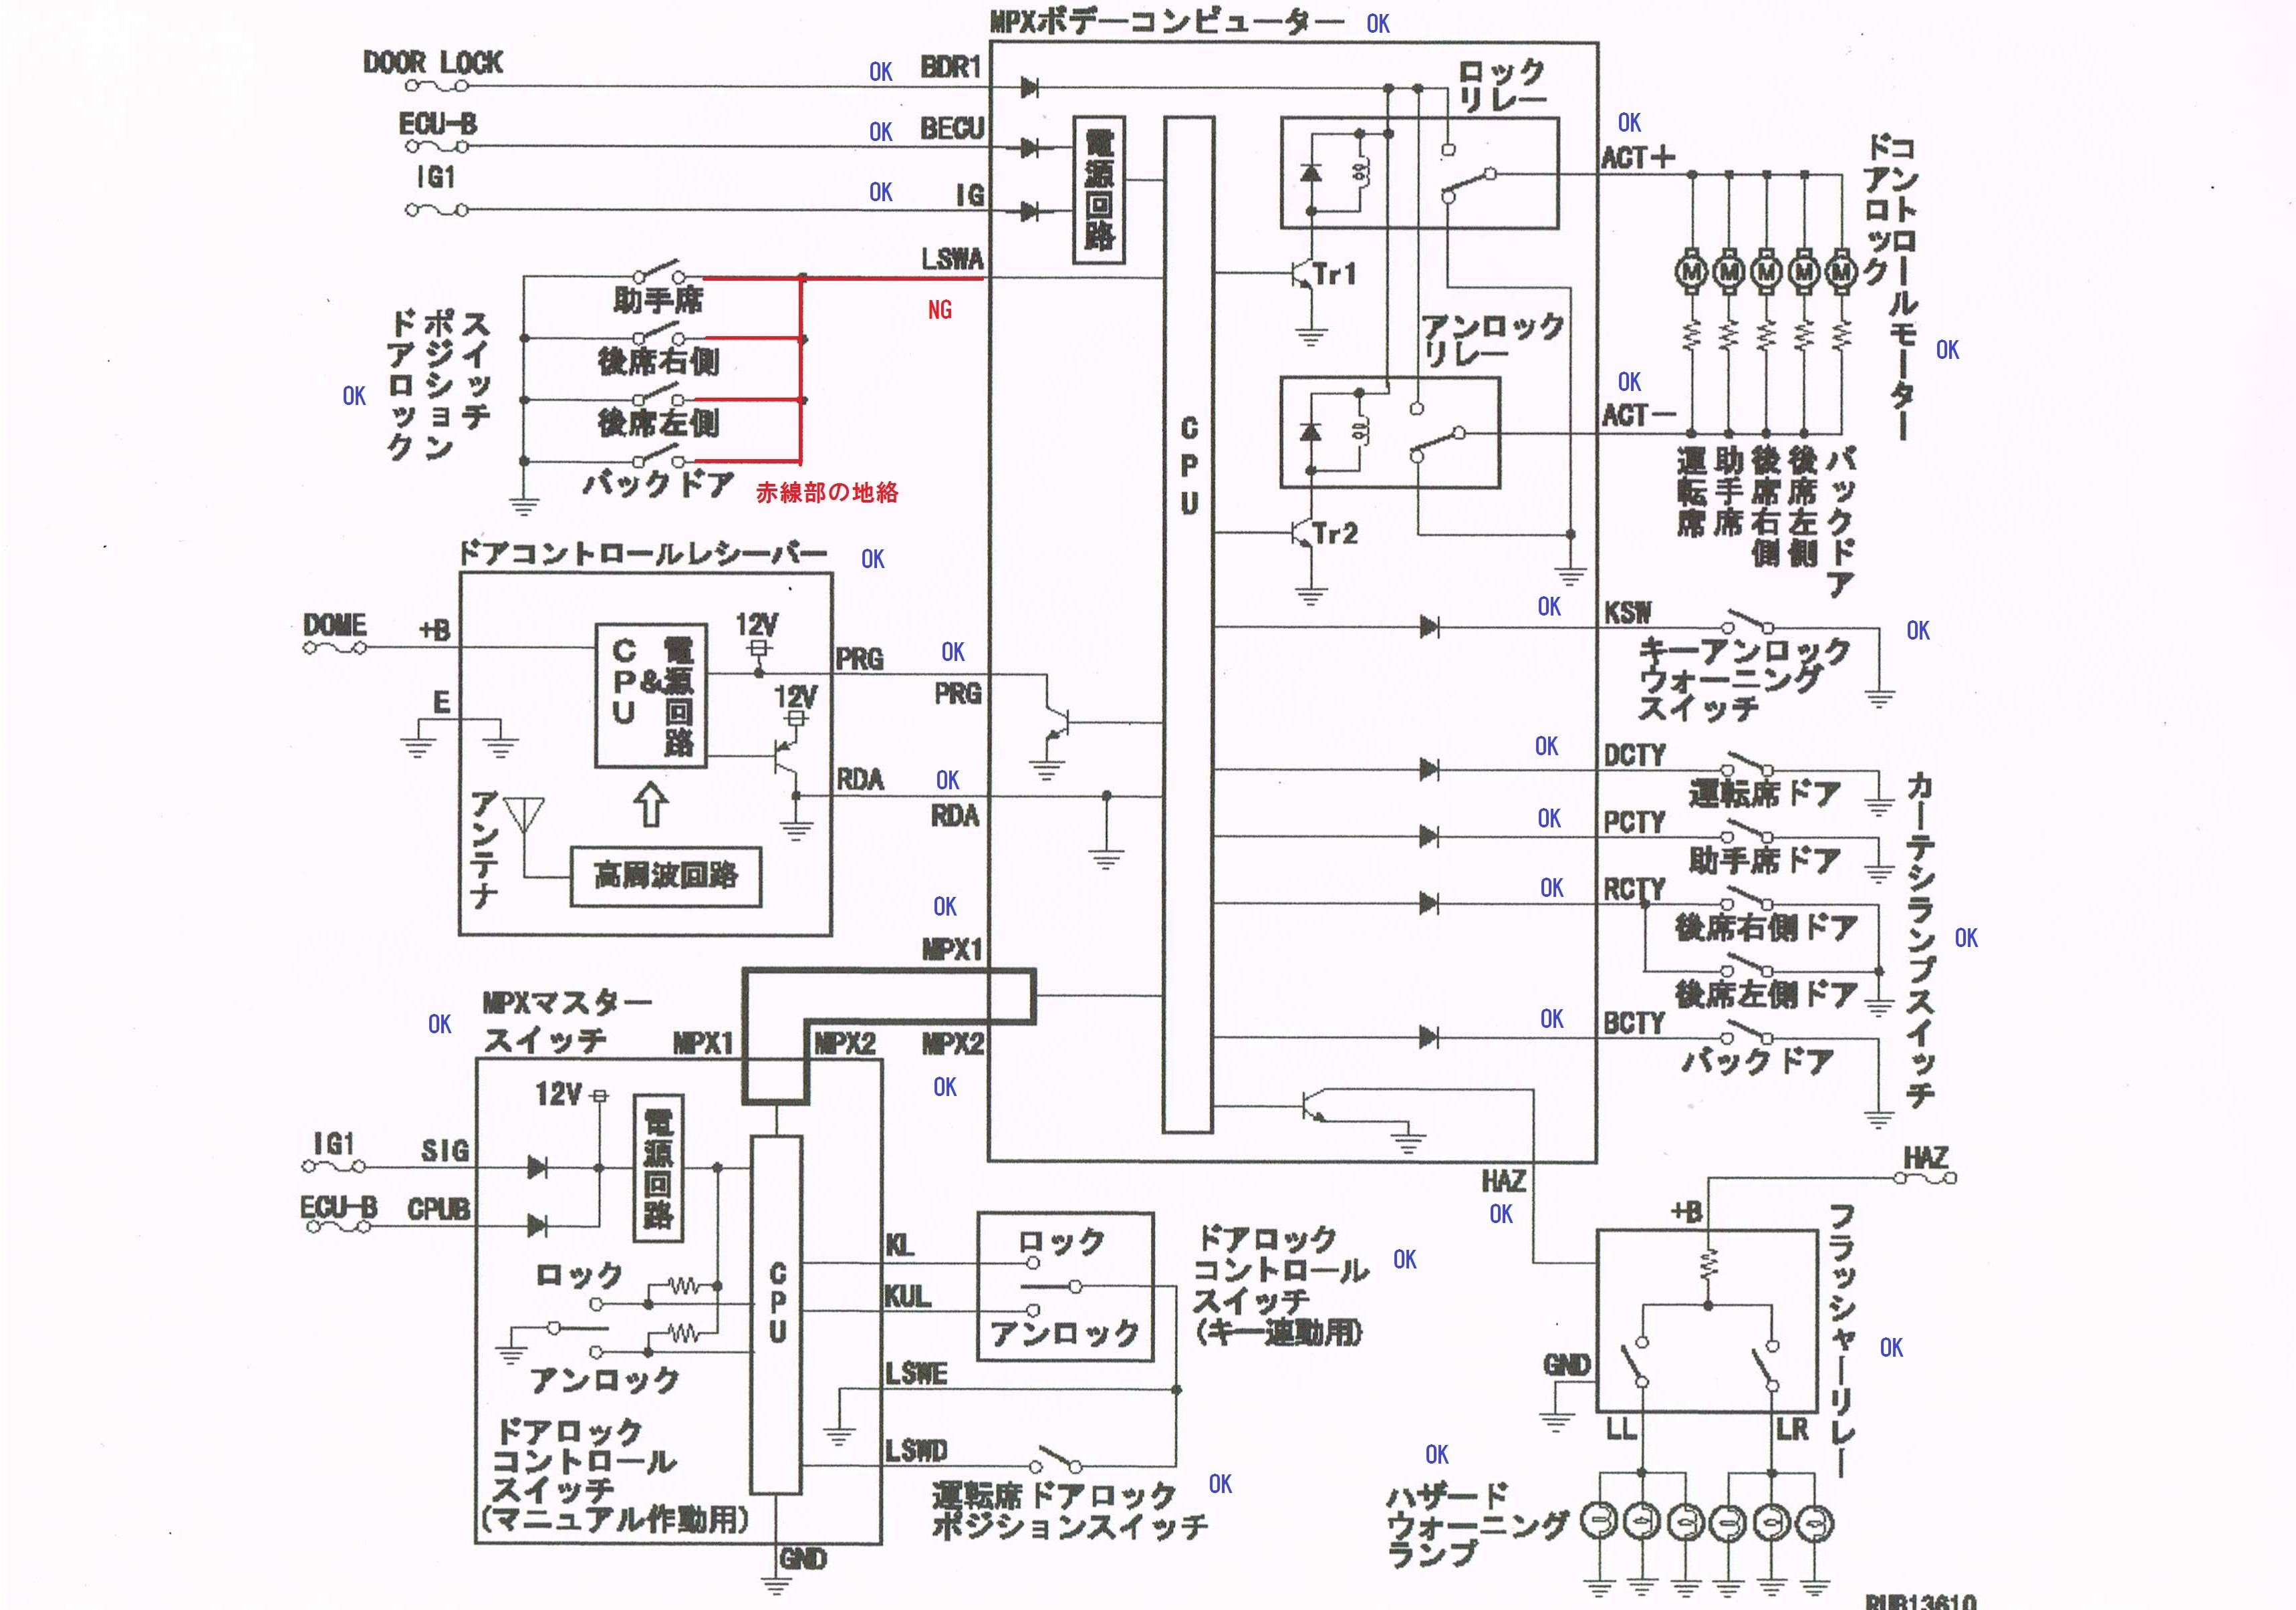 ACU25 DoorLockSystem_1